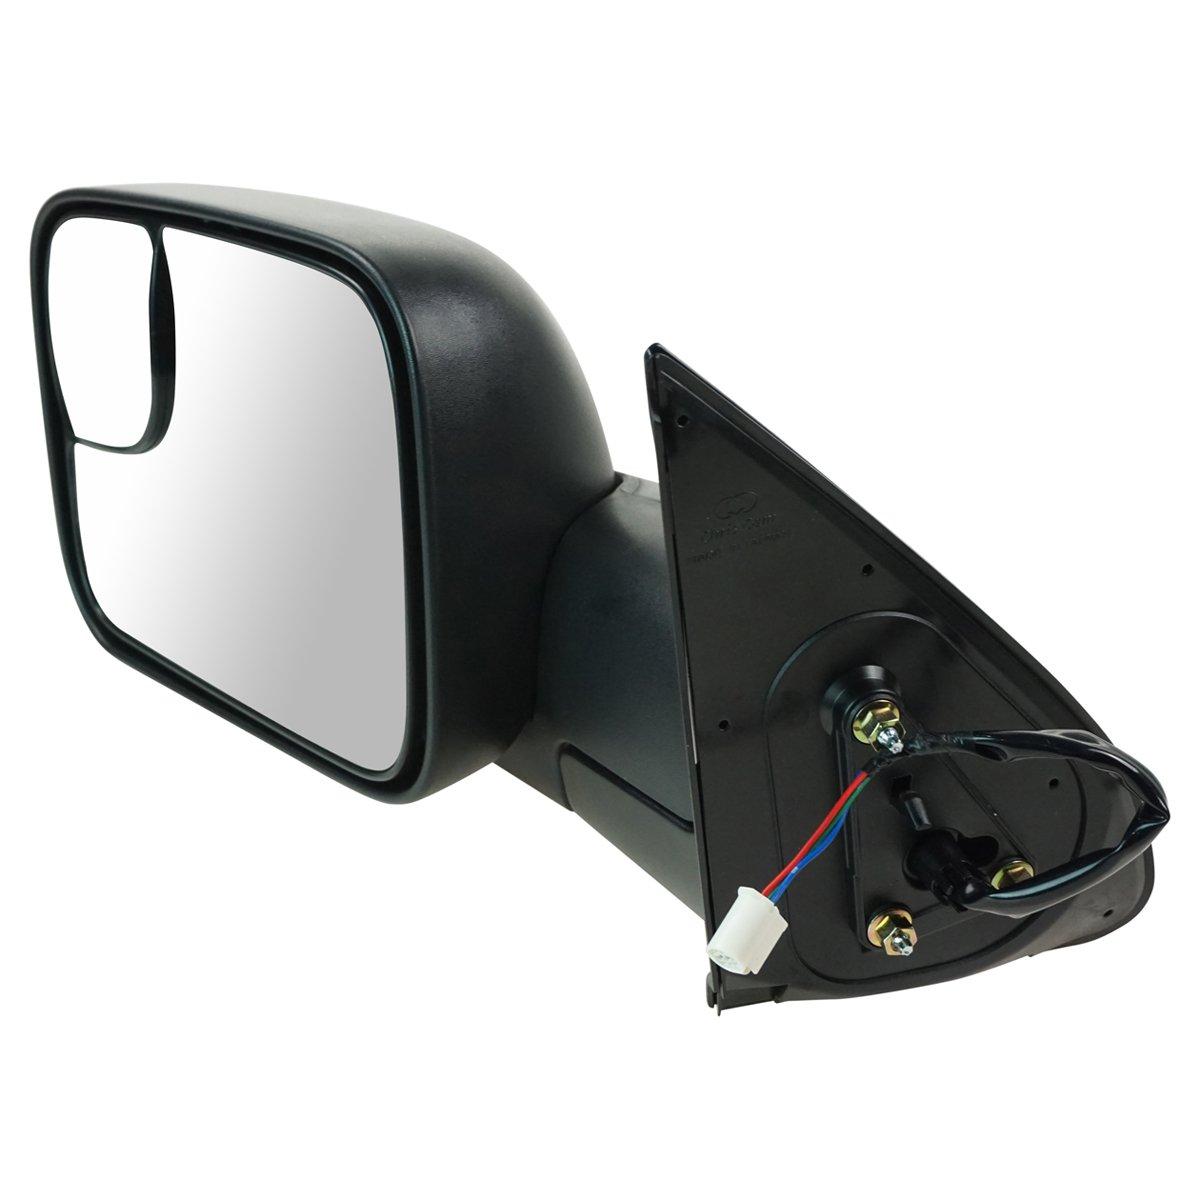 613zs7WYx7L._SL1200_ amazon com trail ridge tow mirror power textured black flip up pair